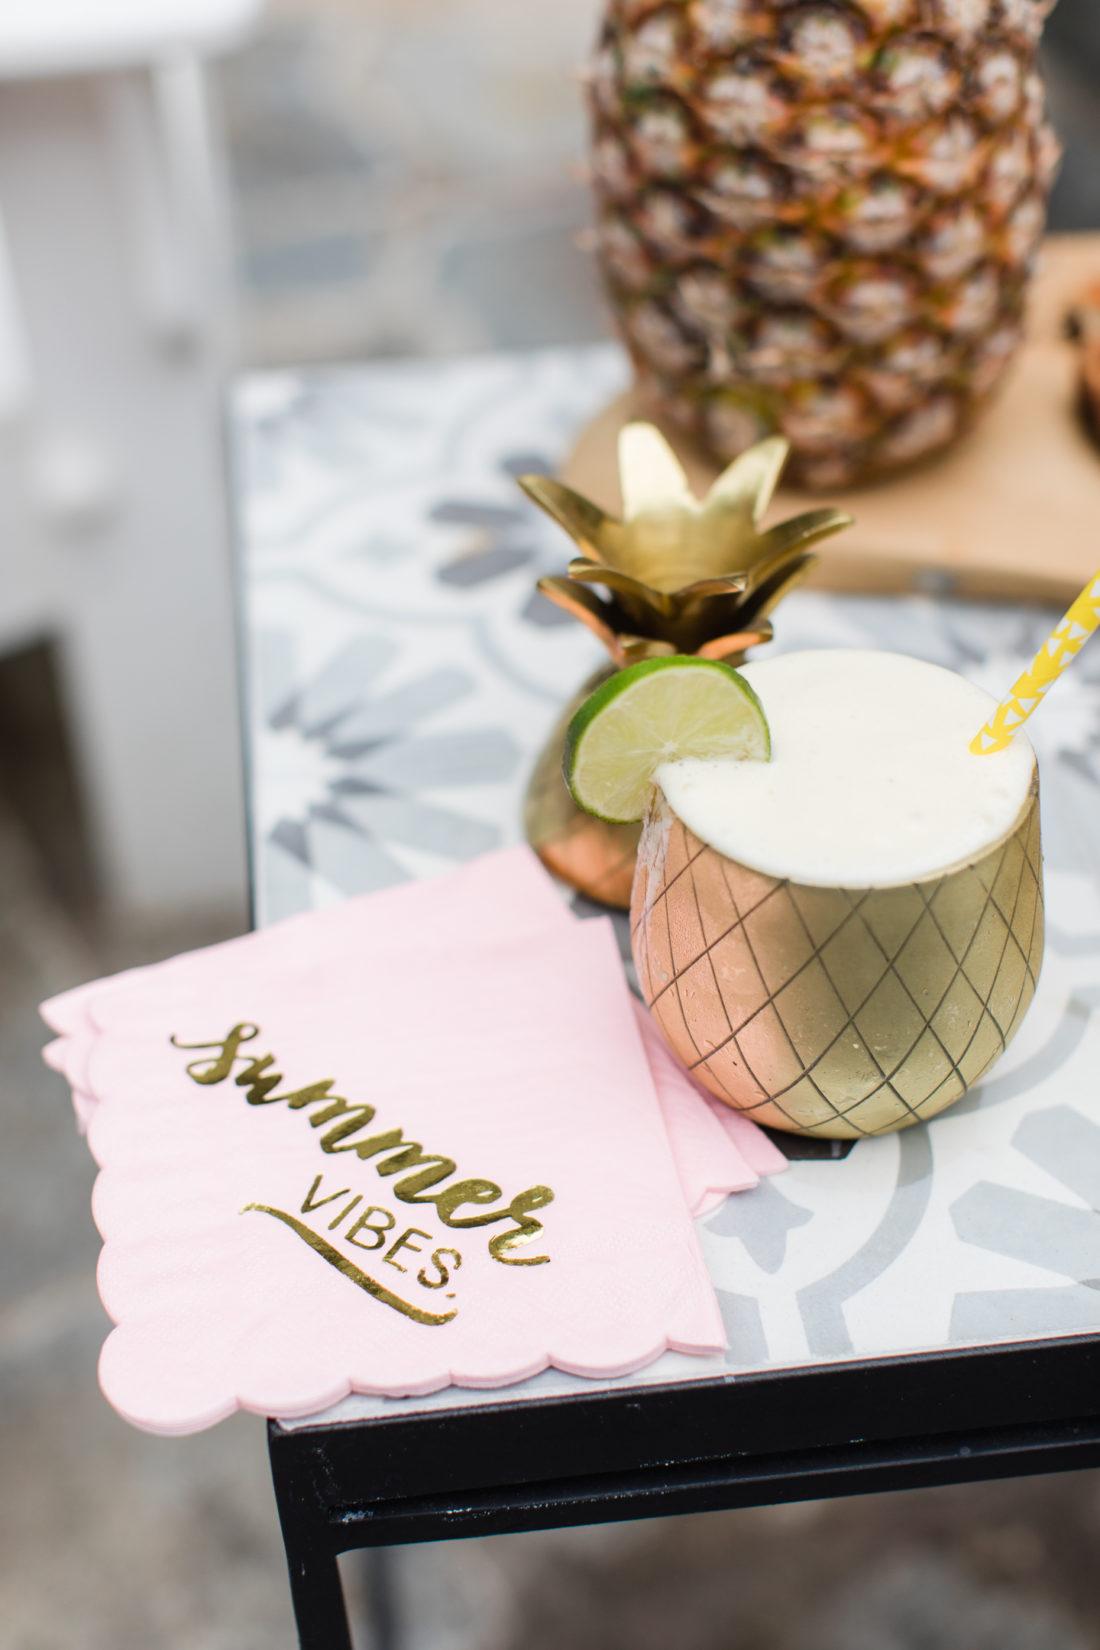 Eva Amurri Martino serves up a frozen pineapple daquiri at her Pineapple themed Happy Hour